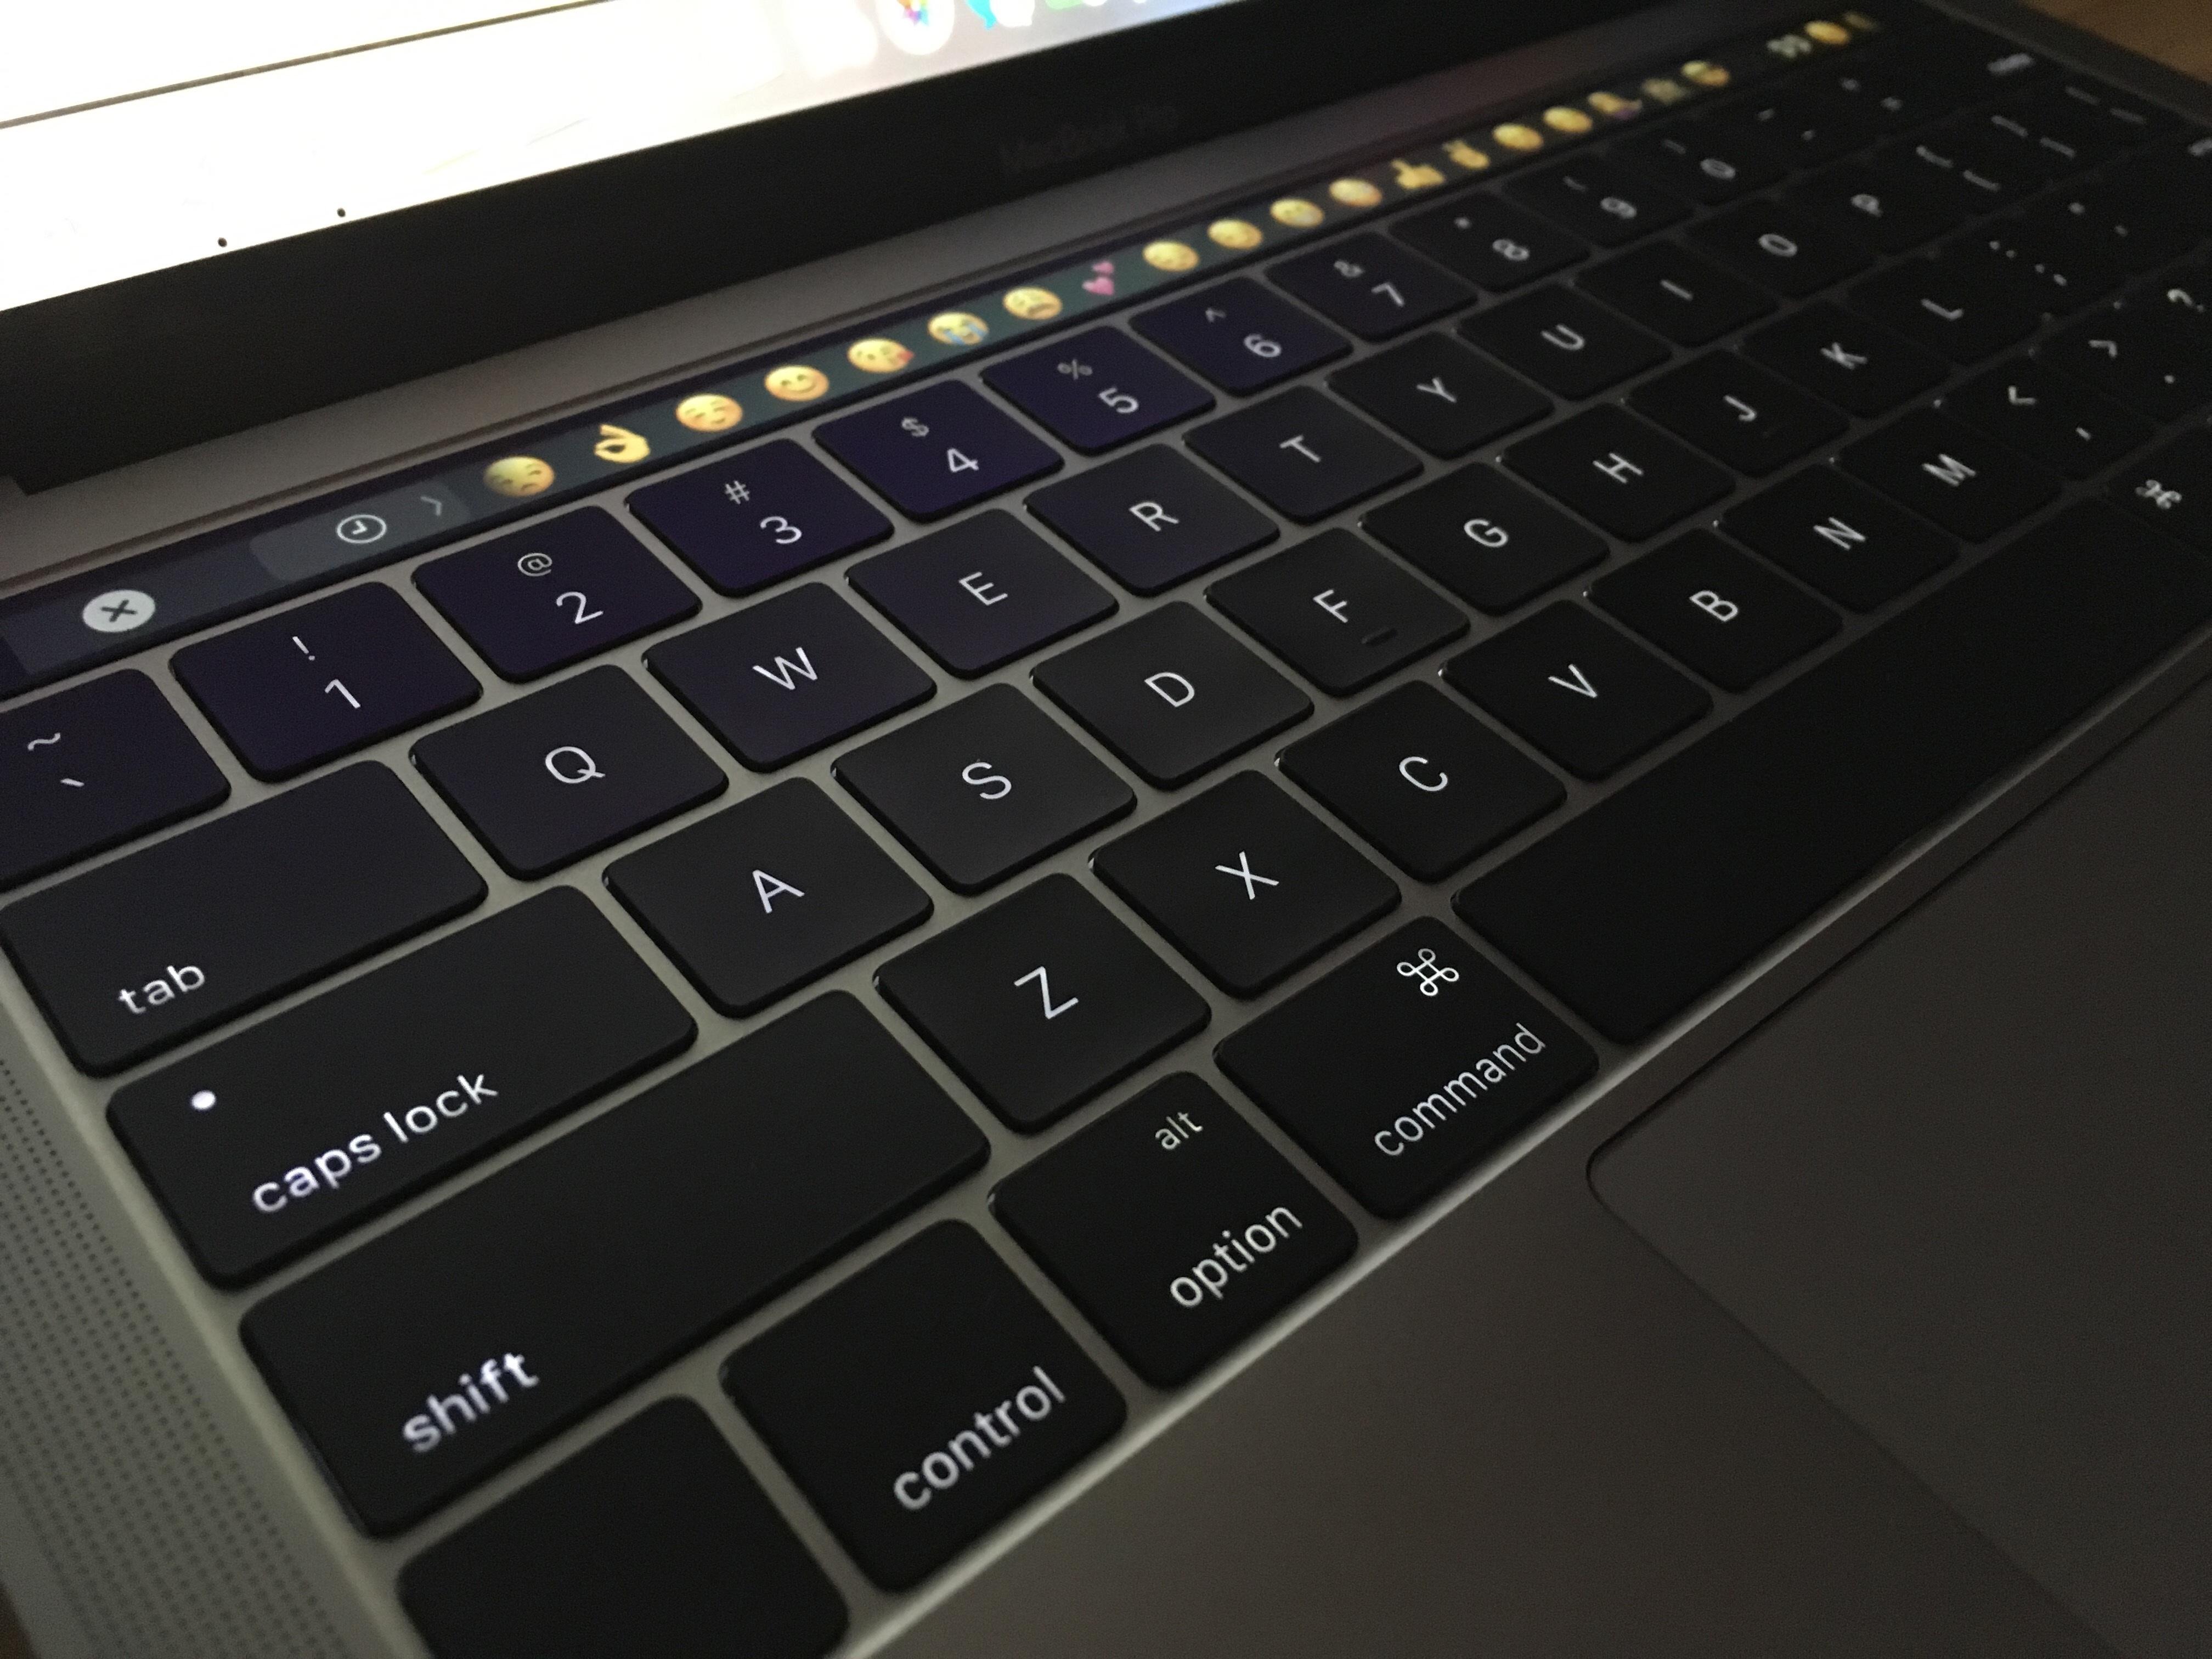 Pro Design Inc: Free Images : Laptop, Technology, Communication, Business